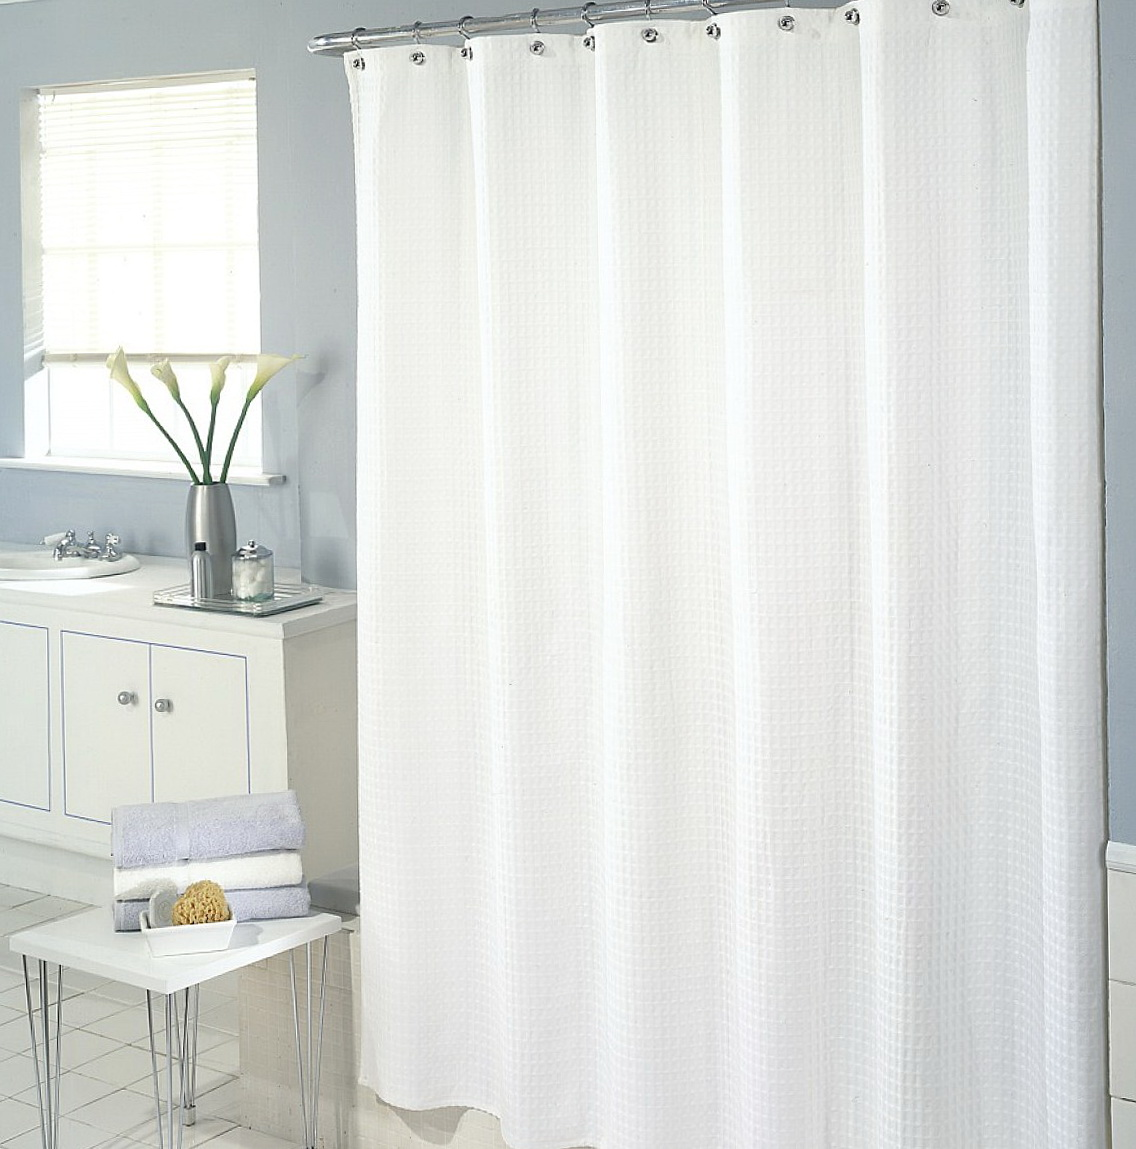 Extra Long Curtain Rods Ikea Home Design Ideas